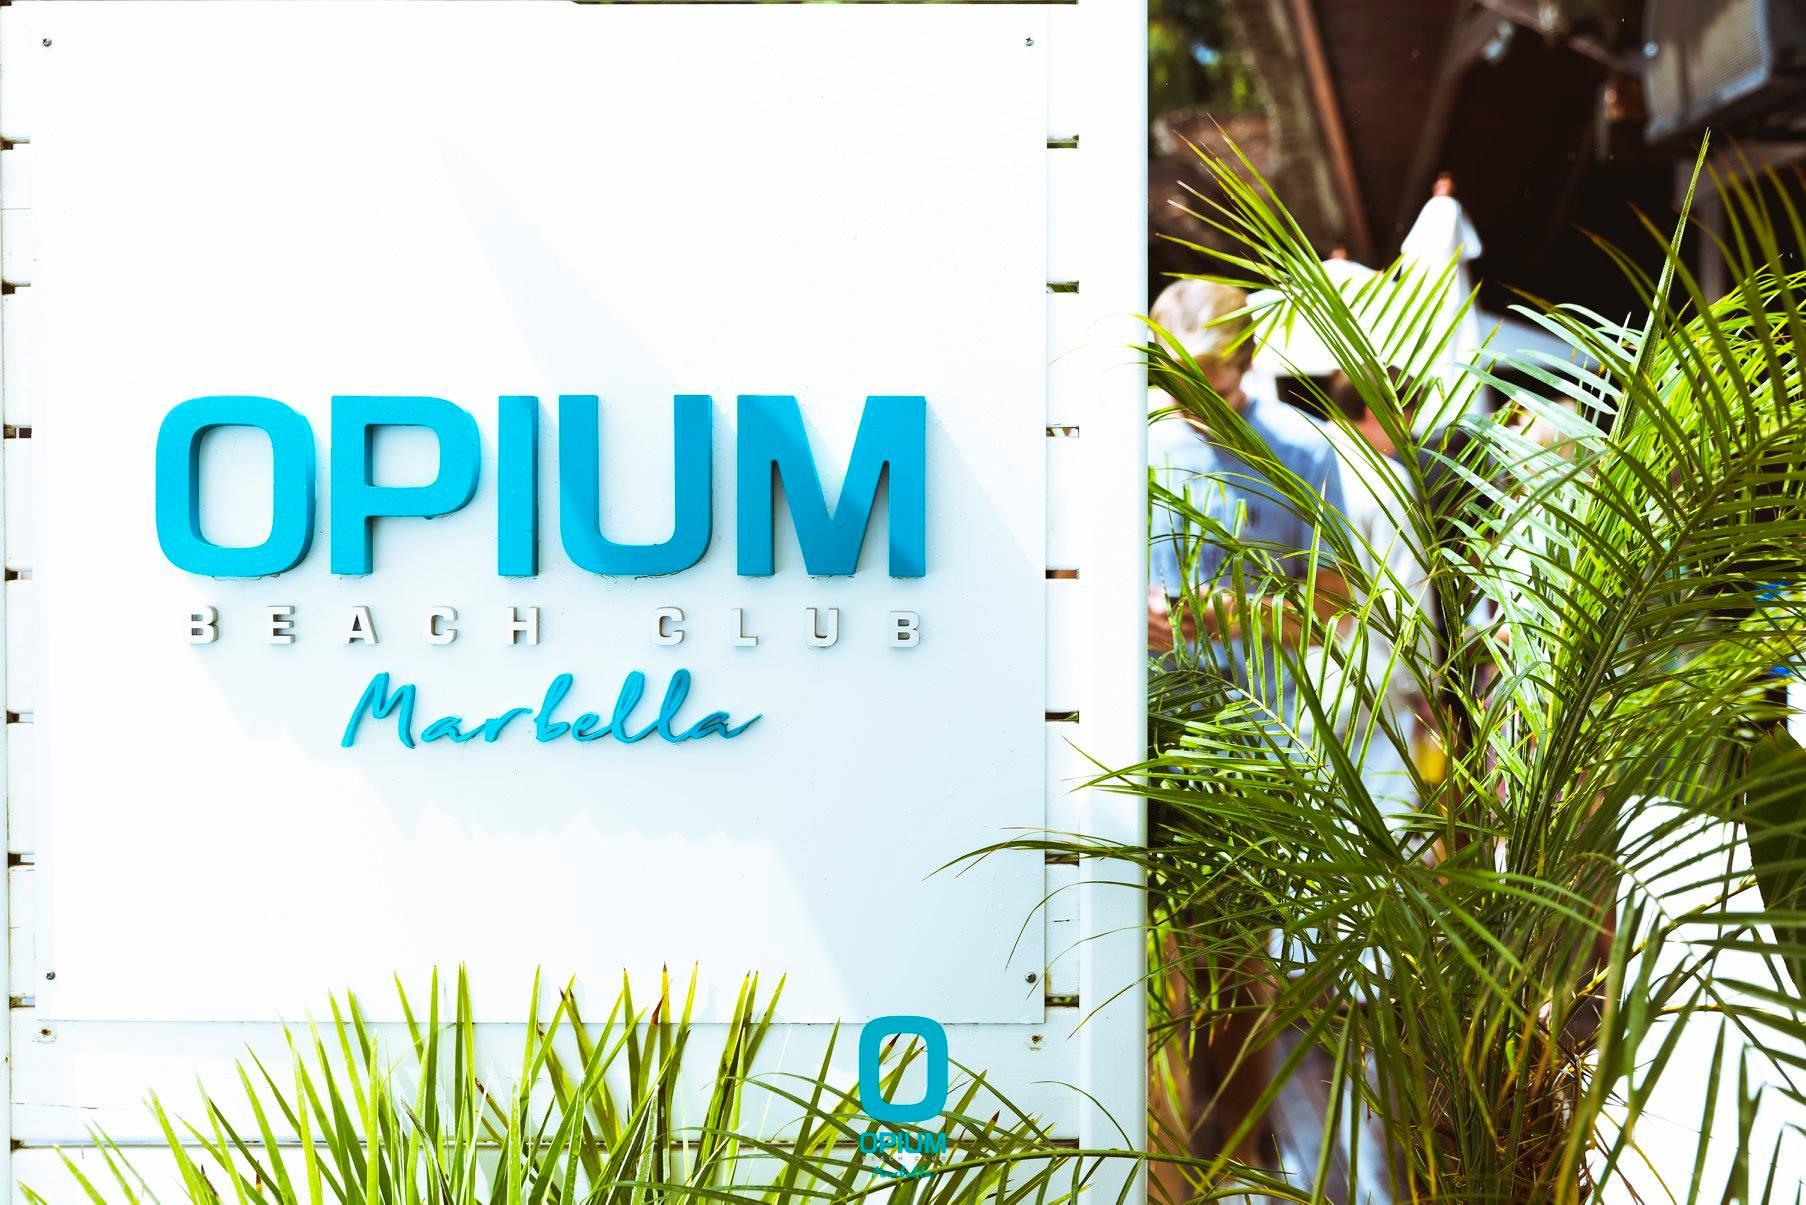 Opium - Beach Club & Restaurant with Shisha in Marbella